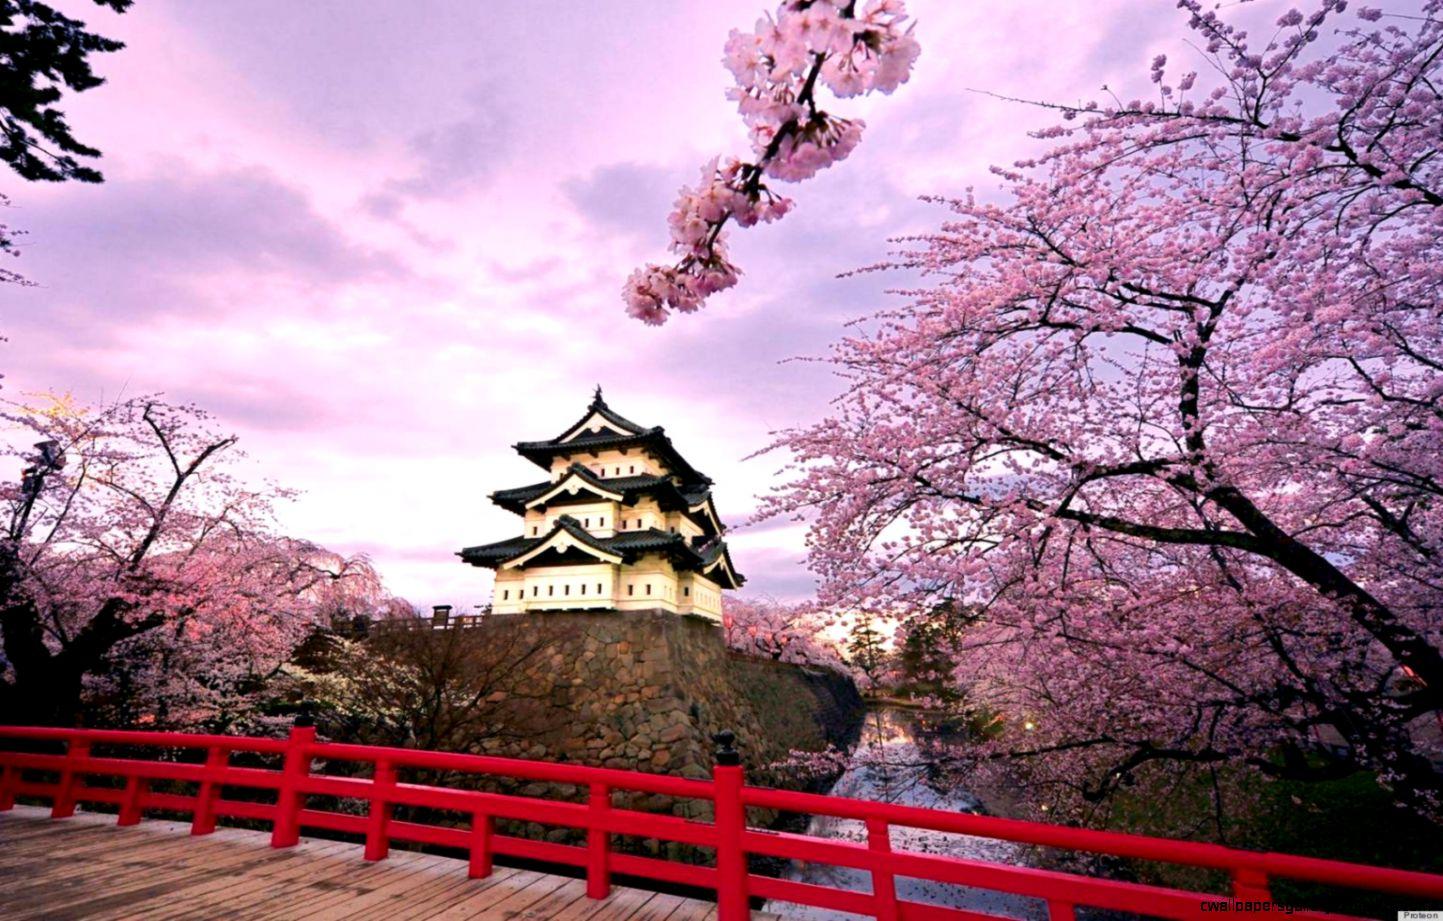 Japanese Cherry Blossom Trees Bursting Into Bloom Make Us